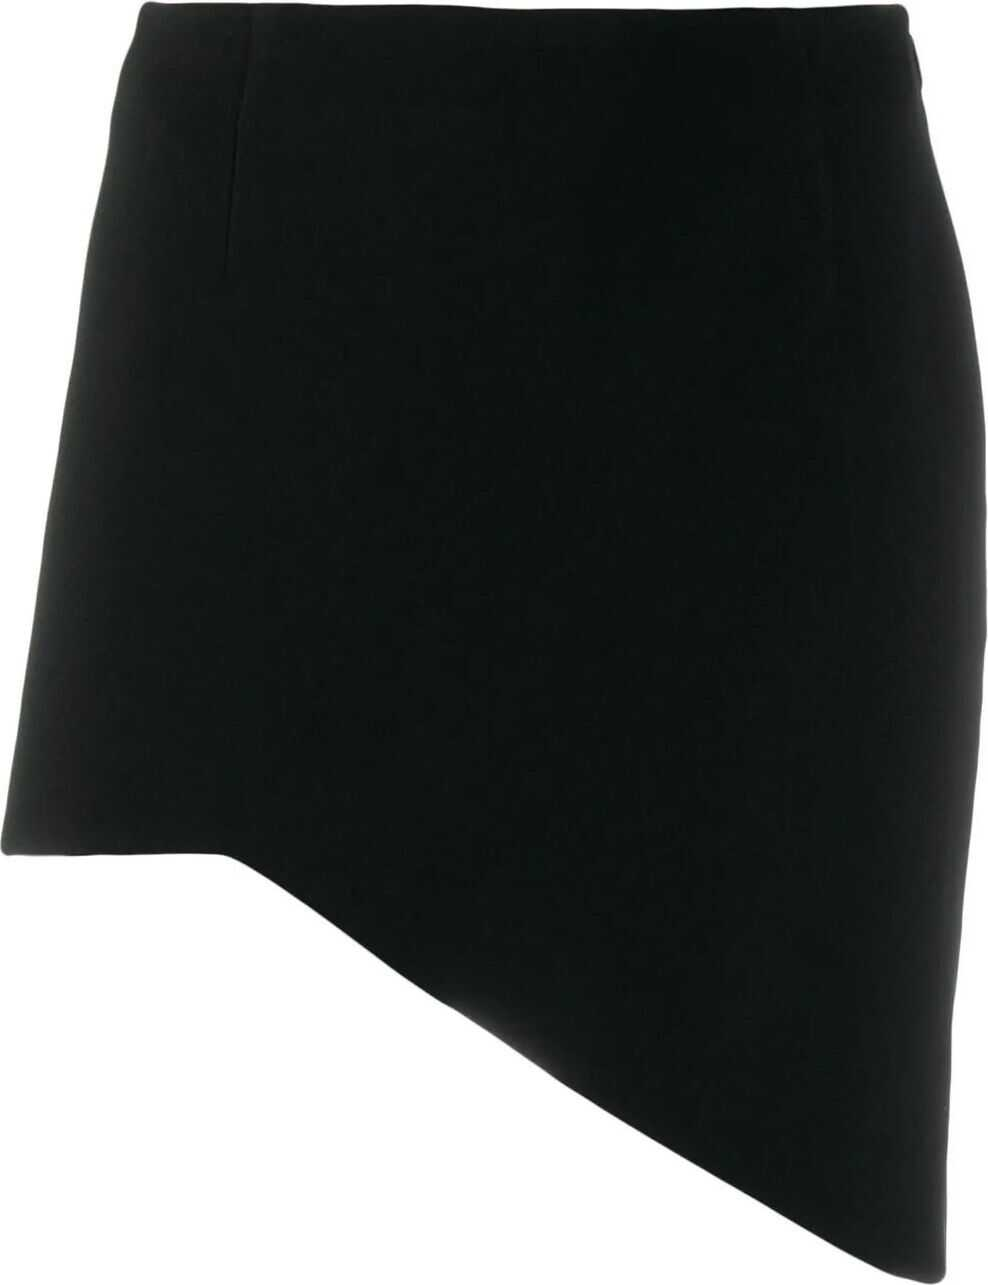 Saint Laurent Acetate Skirt BLACK